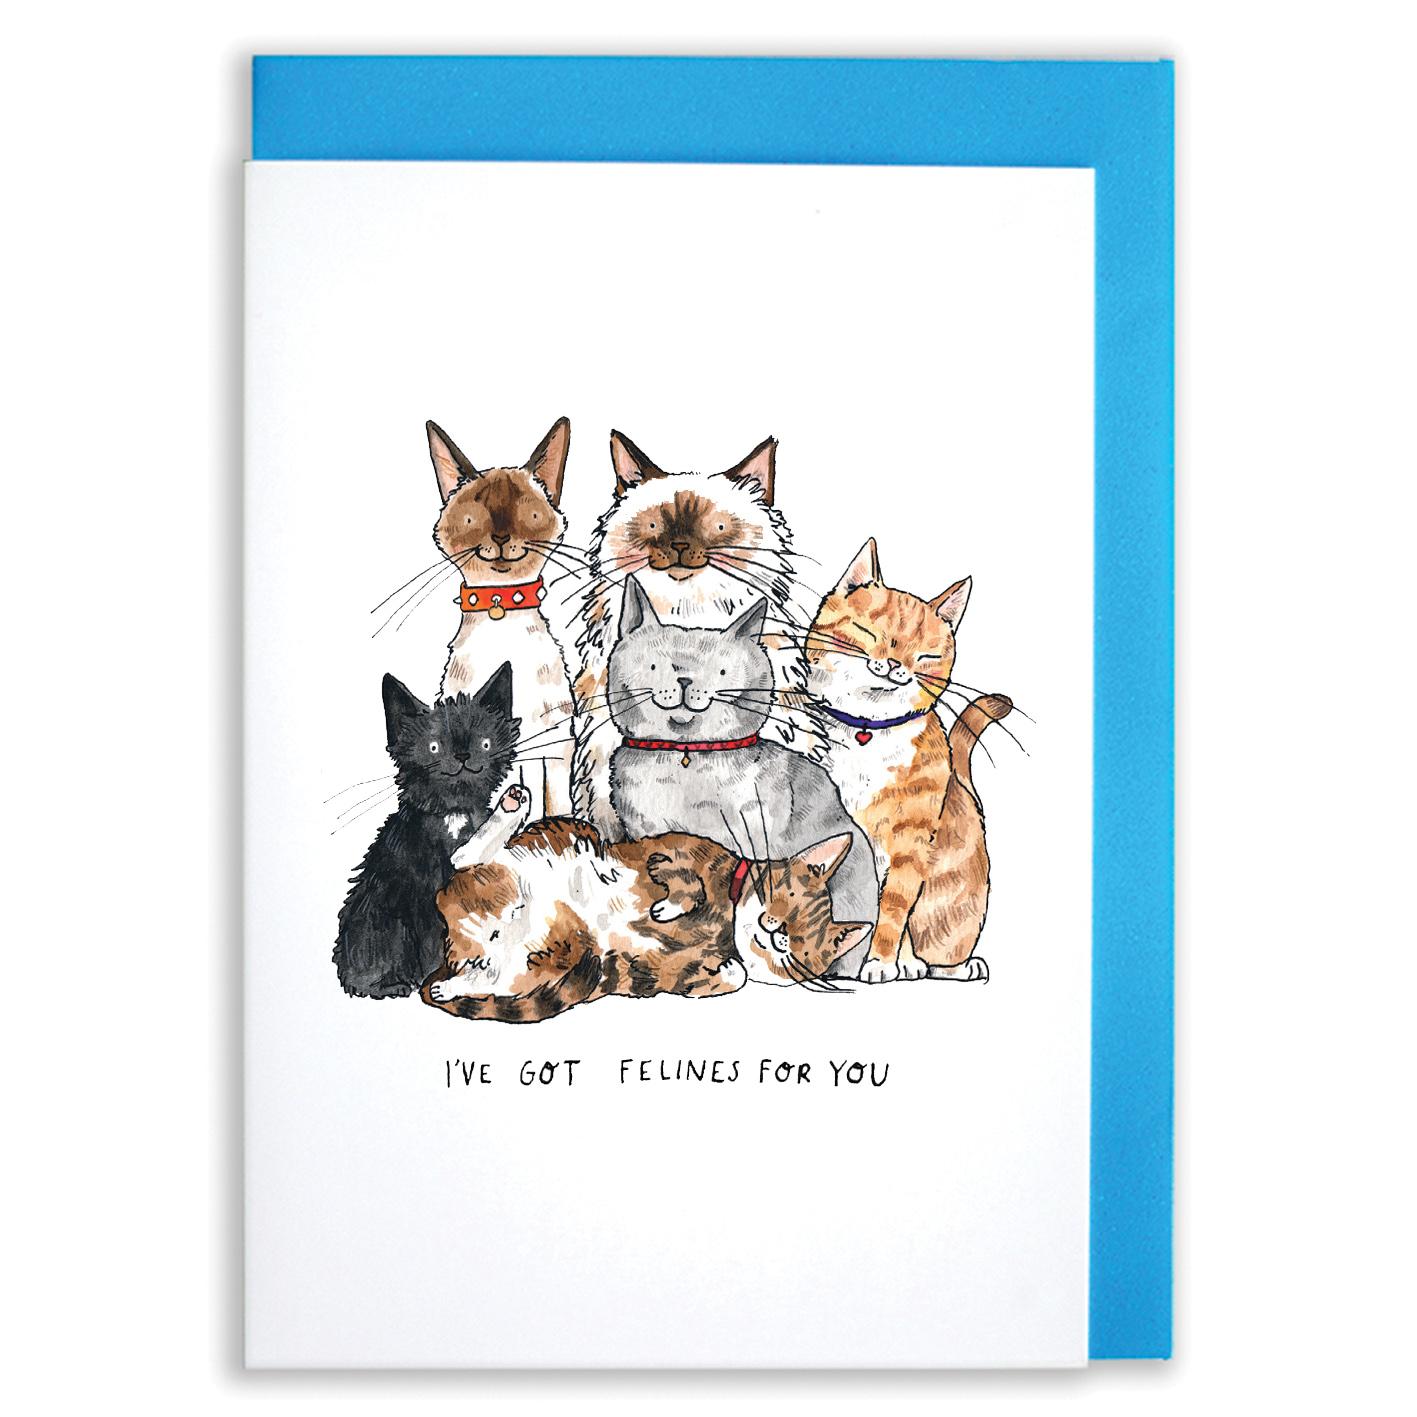 SM72-Felines-for-you-_0003s_0005_SM72-Feines-for-you